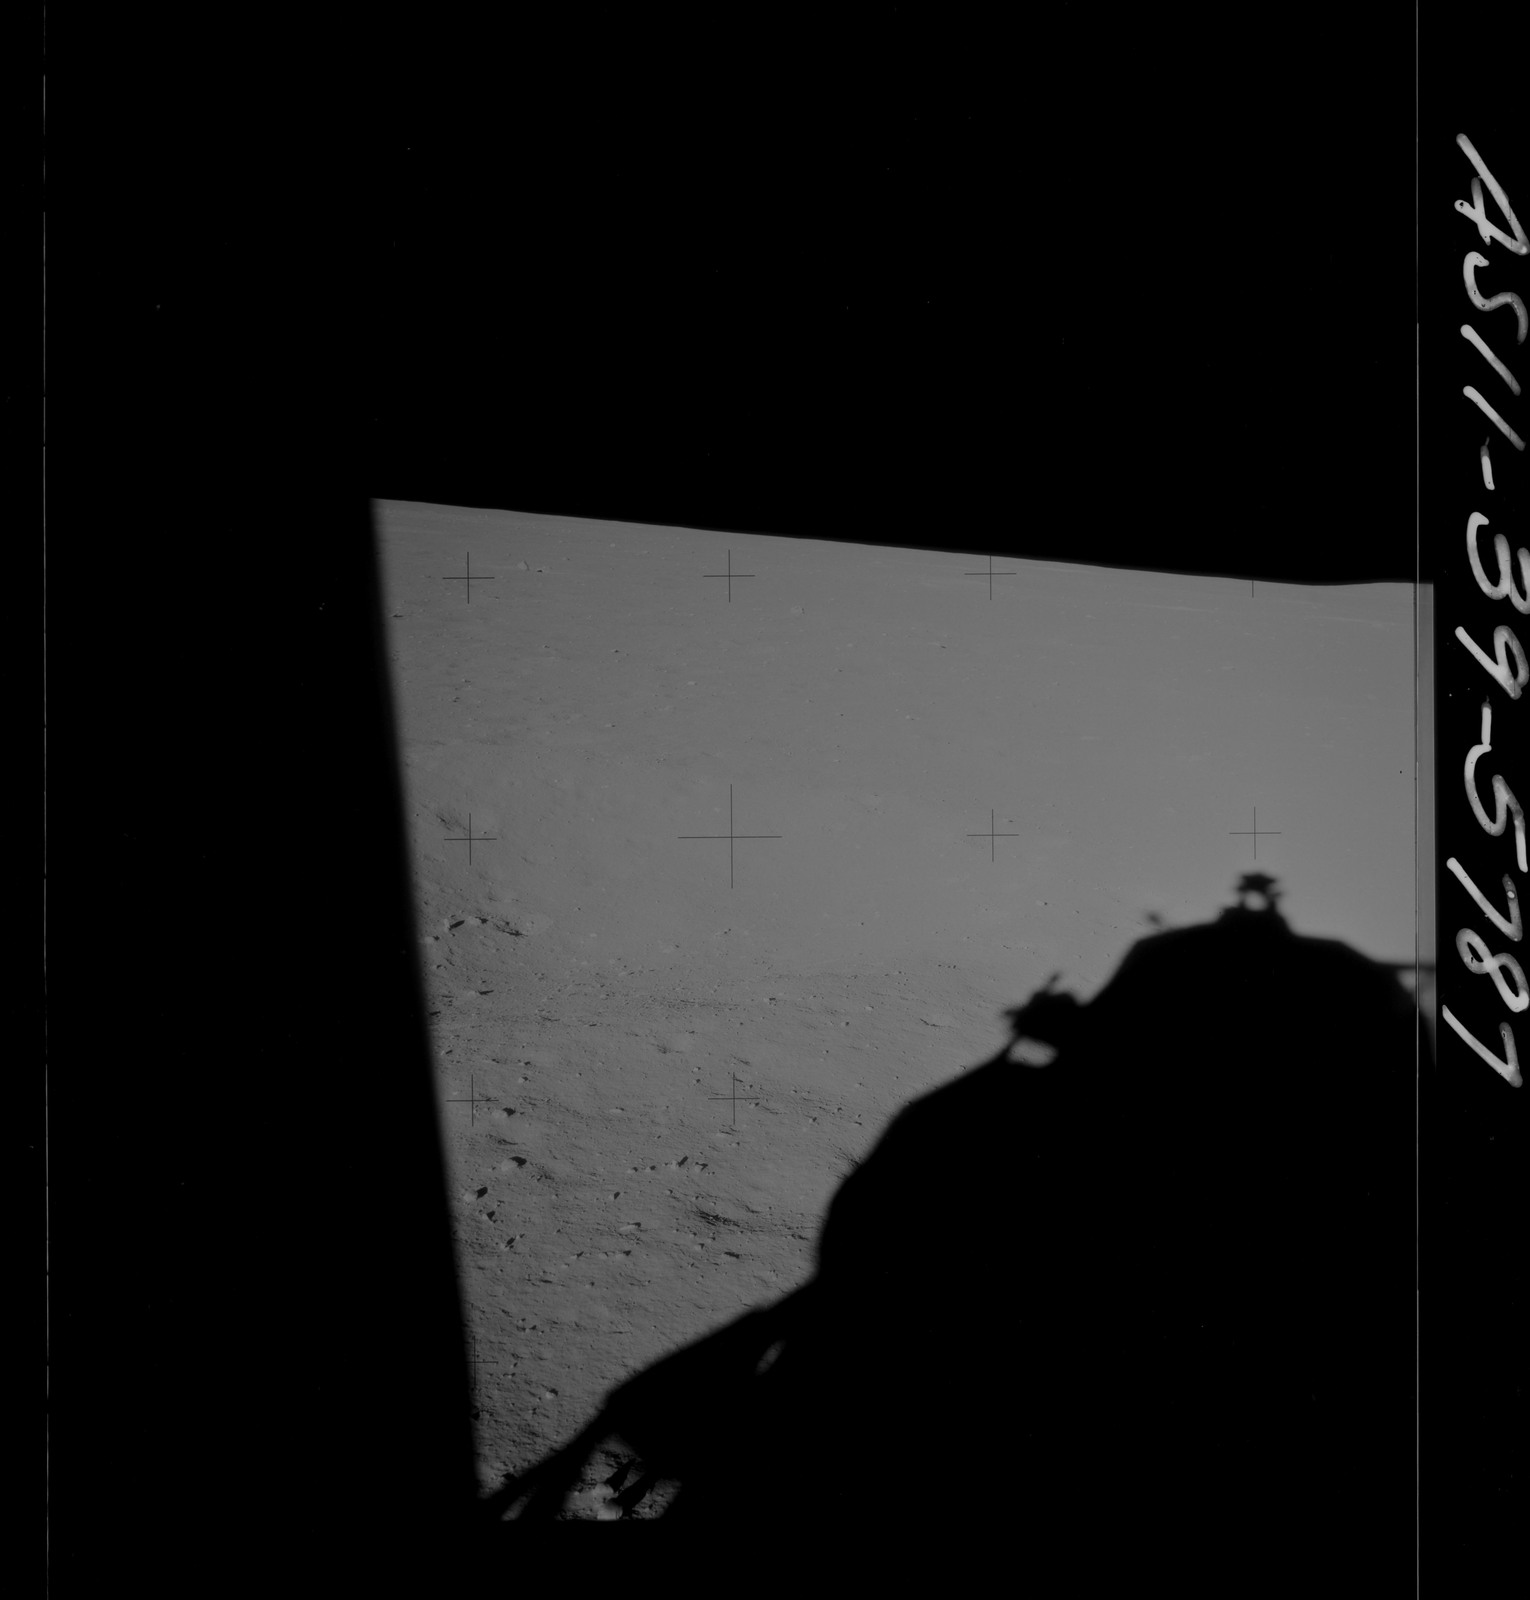 AS11-39-5787 - Apollo 11 - Apollo 11 Mission image - Shadow of Lunar Module on lunar surface